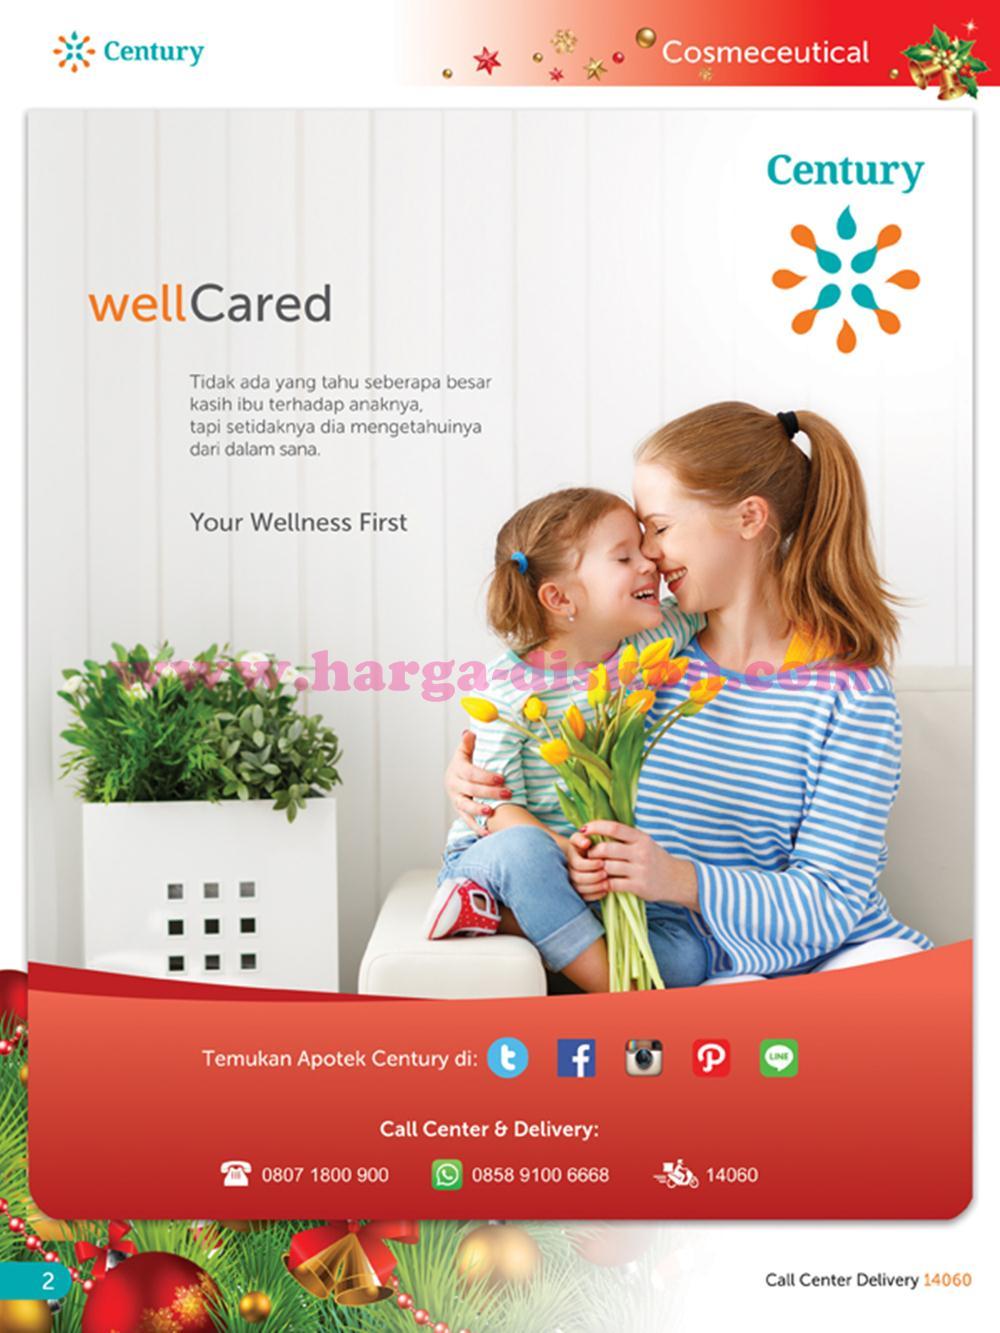 Katalog Promo Century Pharma Terbaru Desember 2018 Harga Promo